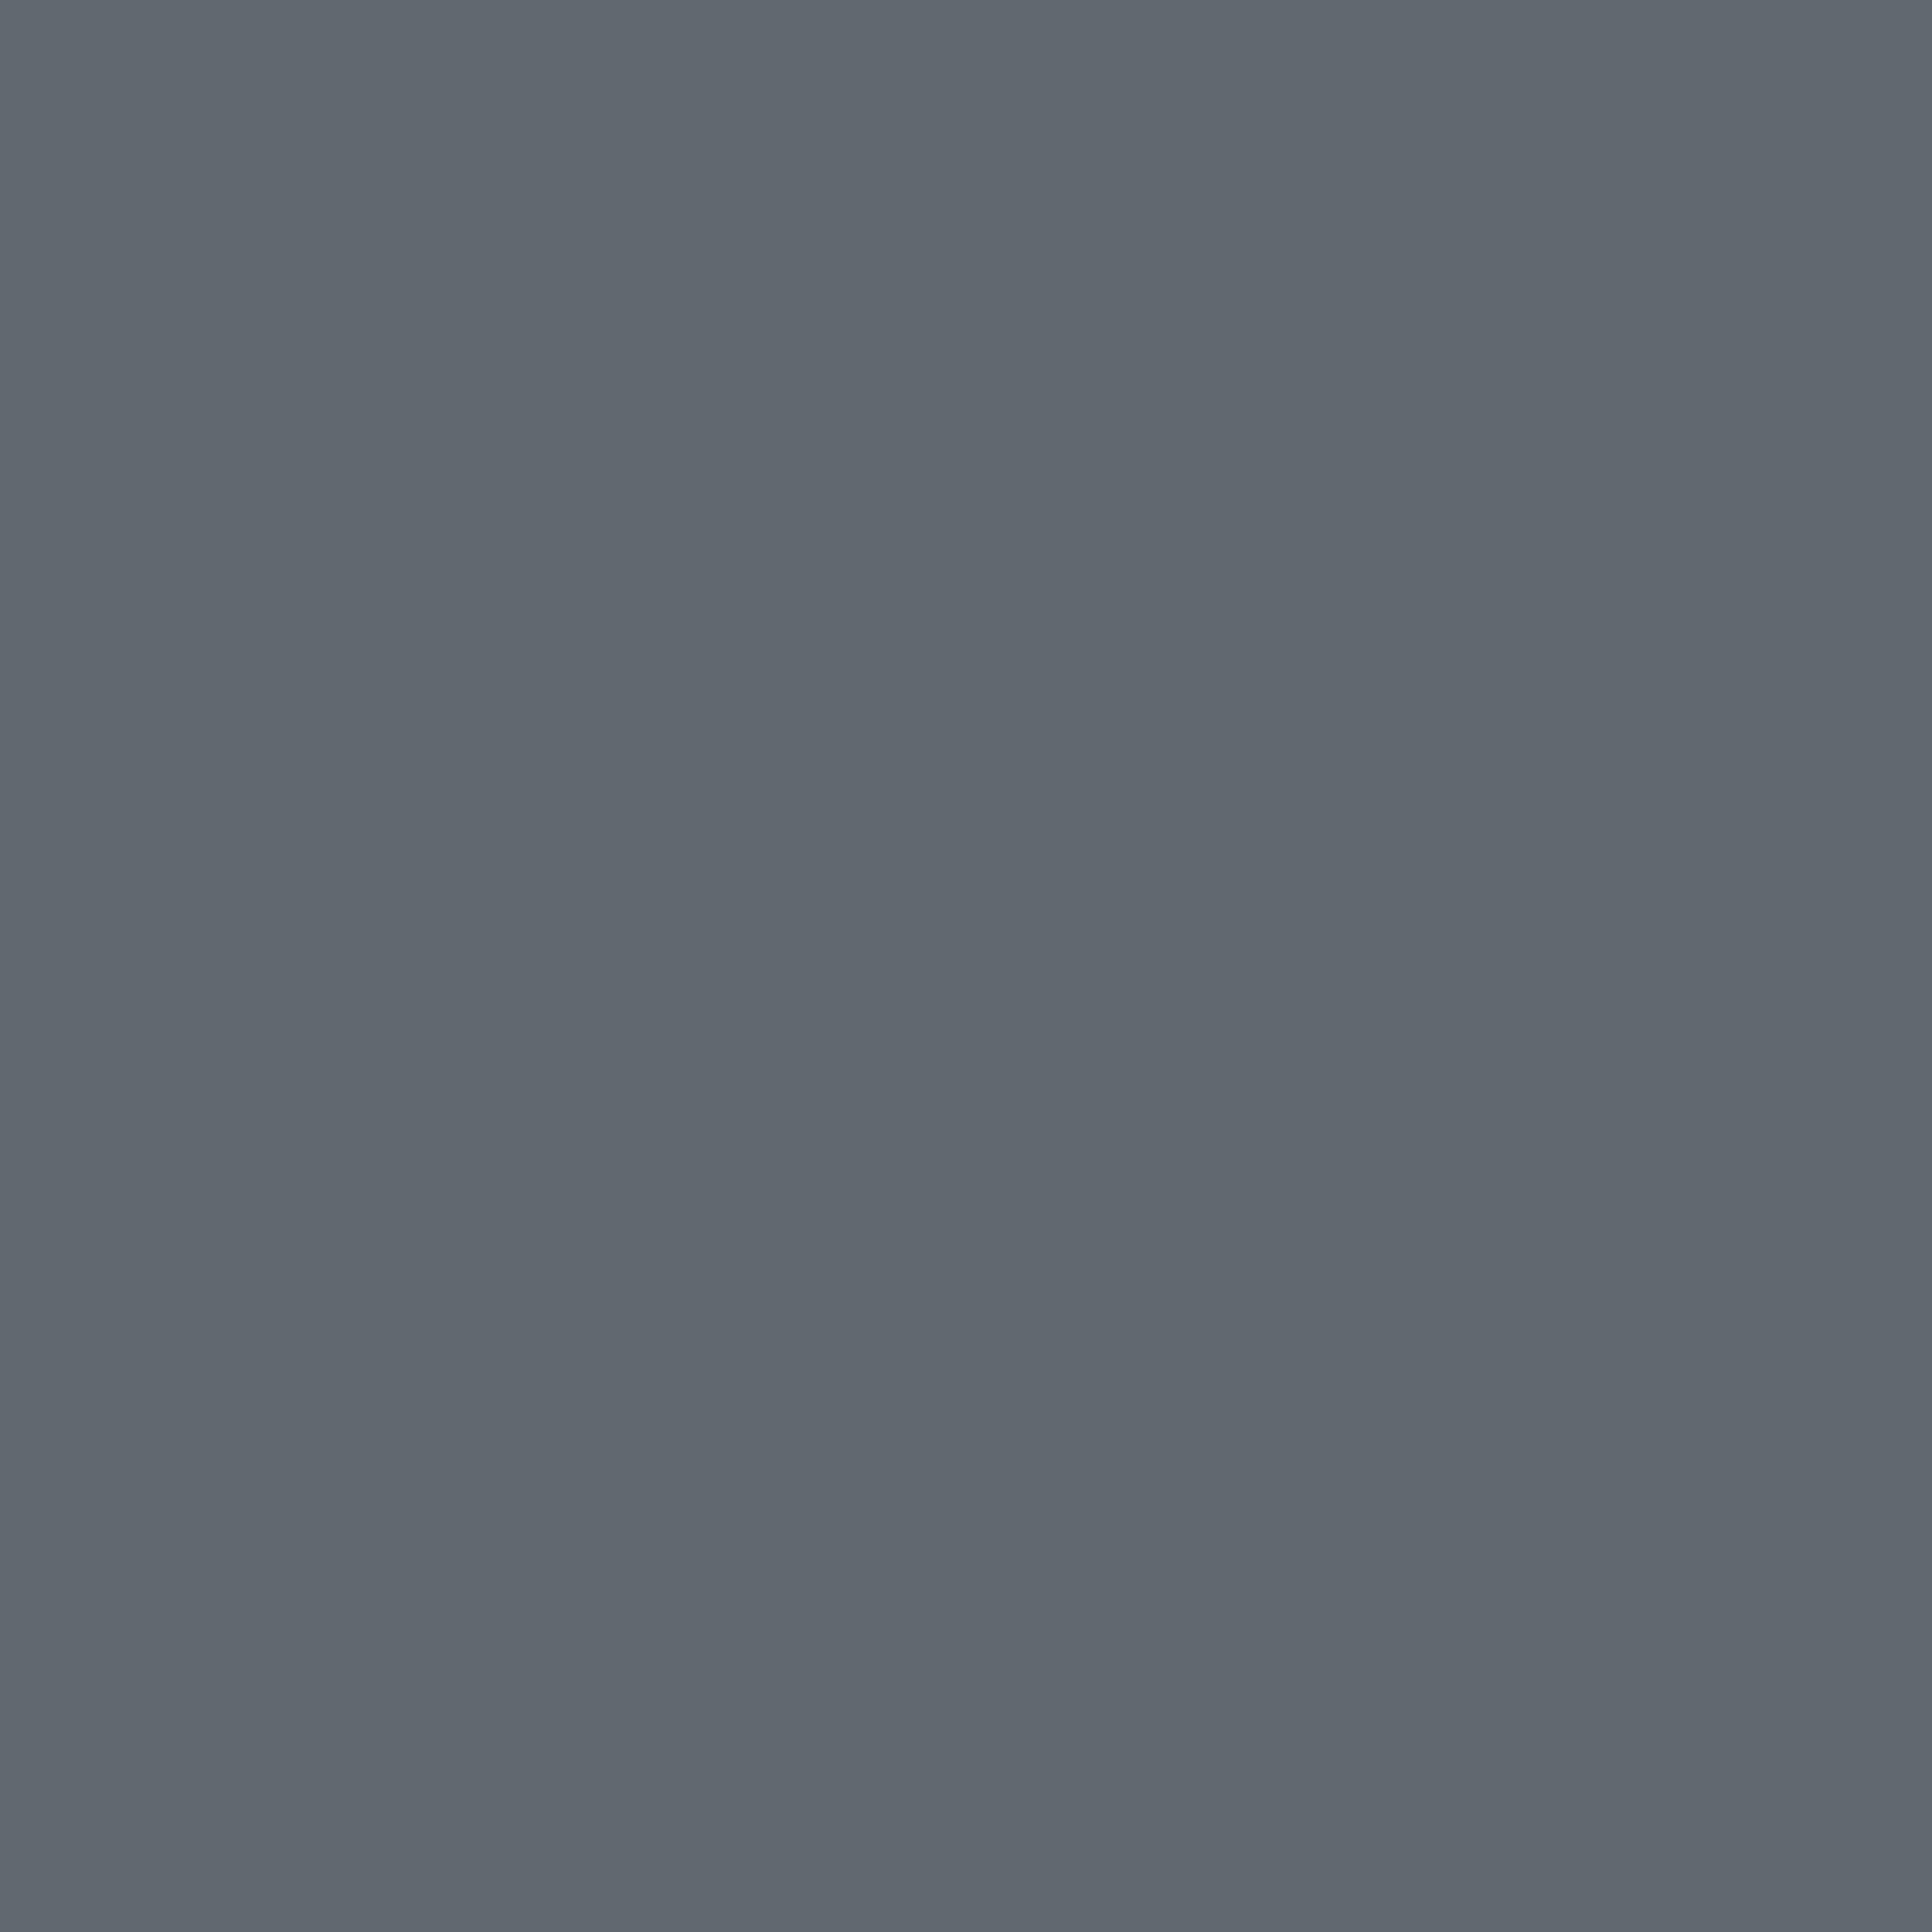 Titiano-grey